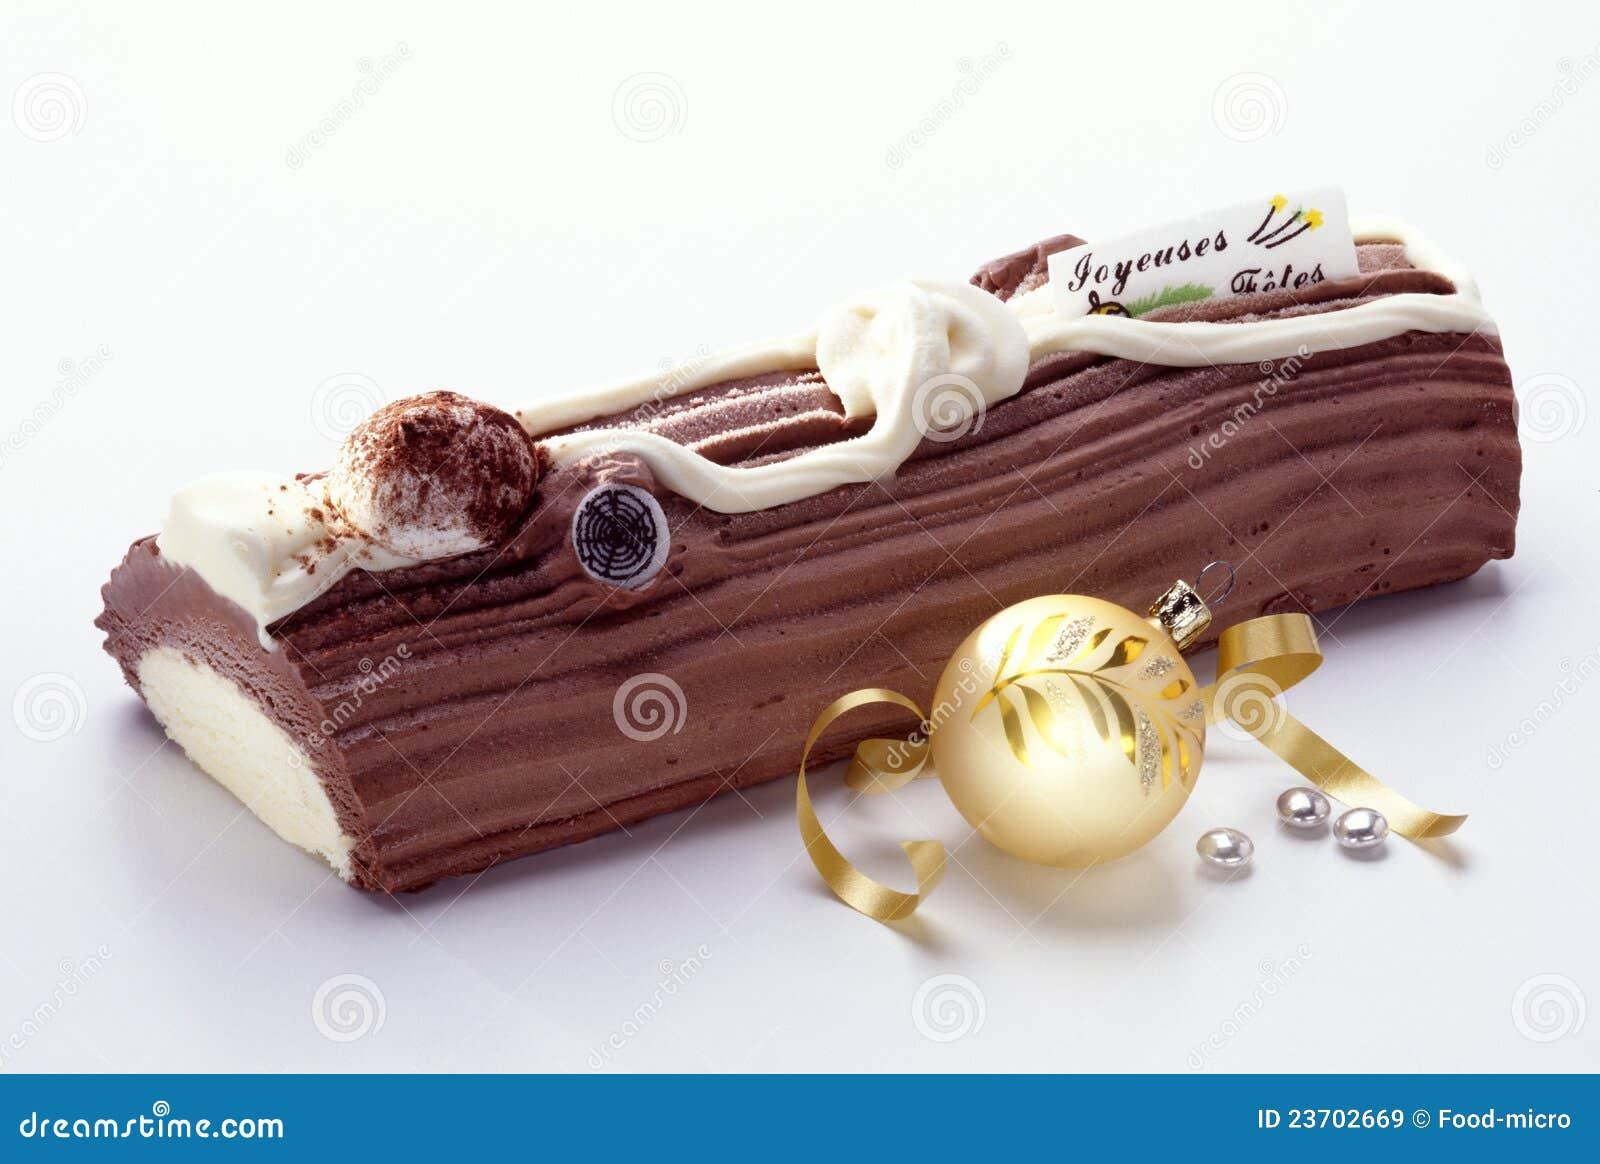 Yule Log Ice Cream Cake